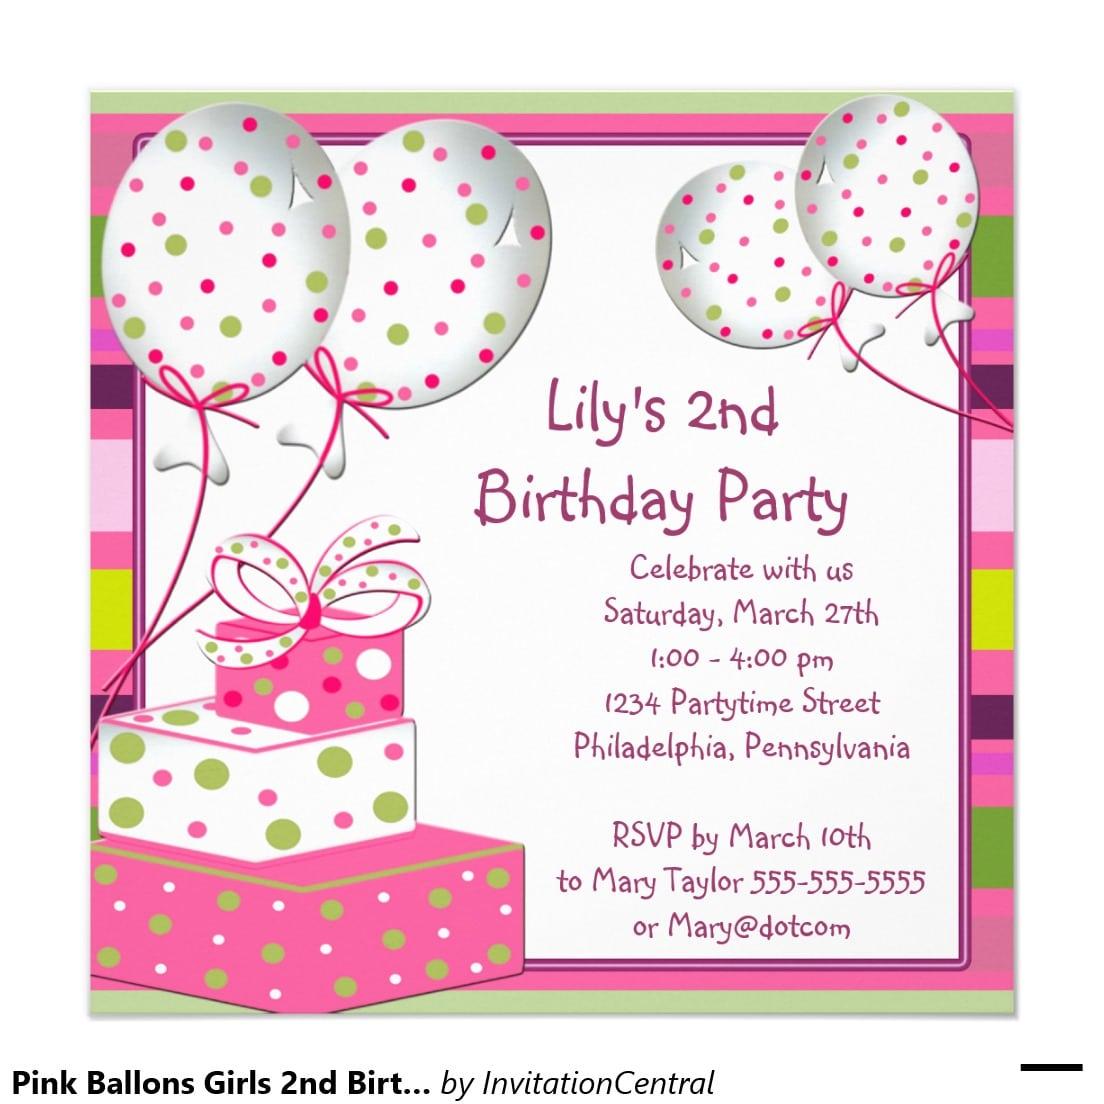 Make Birthday Party Invitations